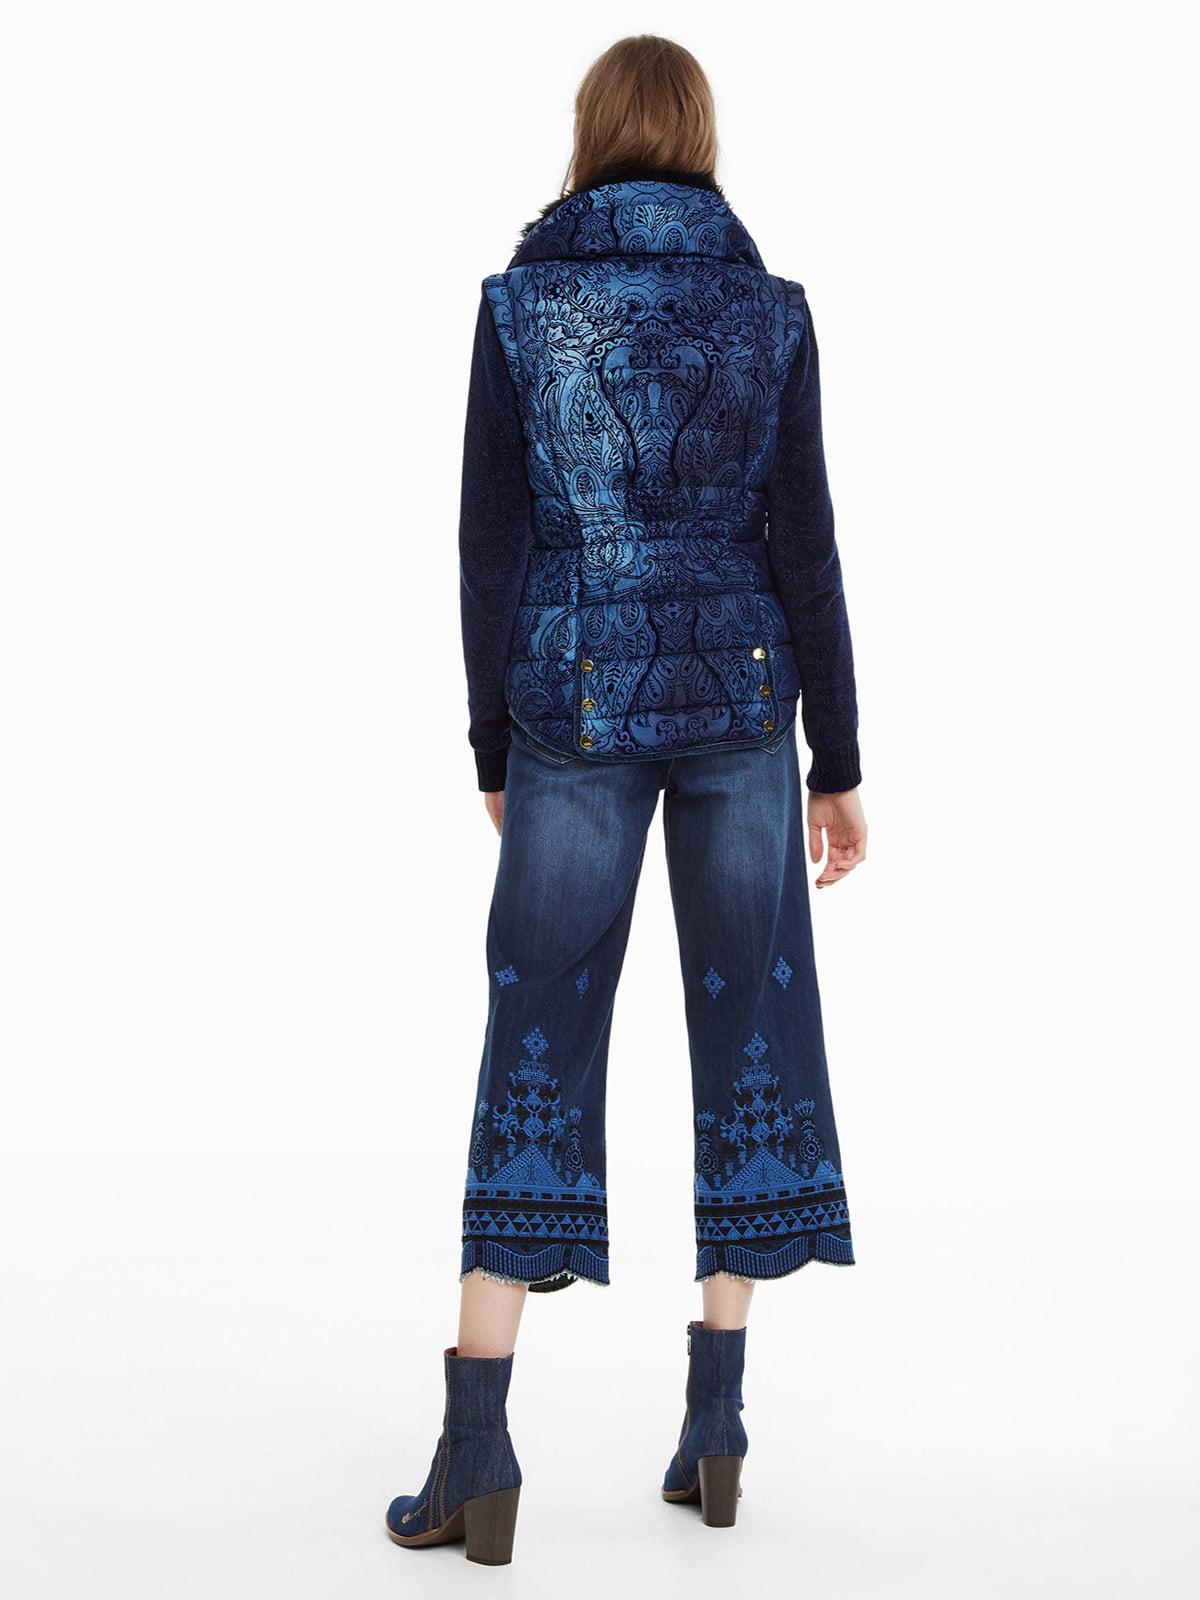 Куртка синя з принтом | 4524254 | фото 7